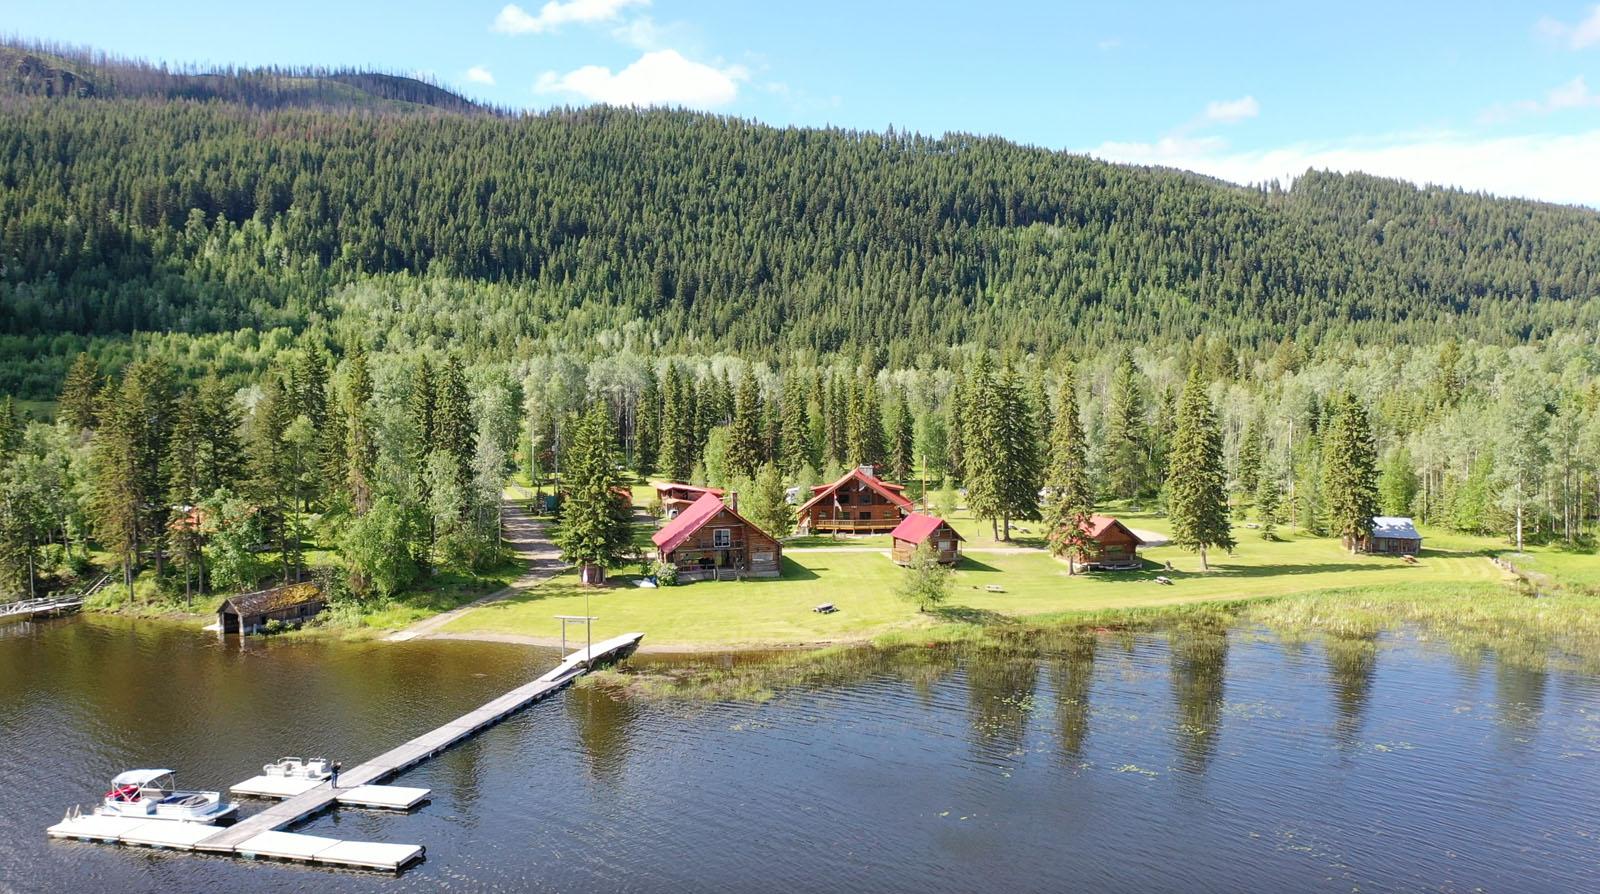 Canim lake resort 10